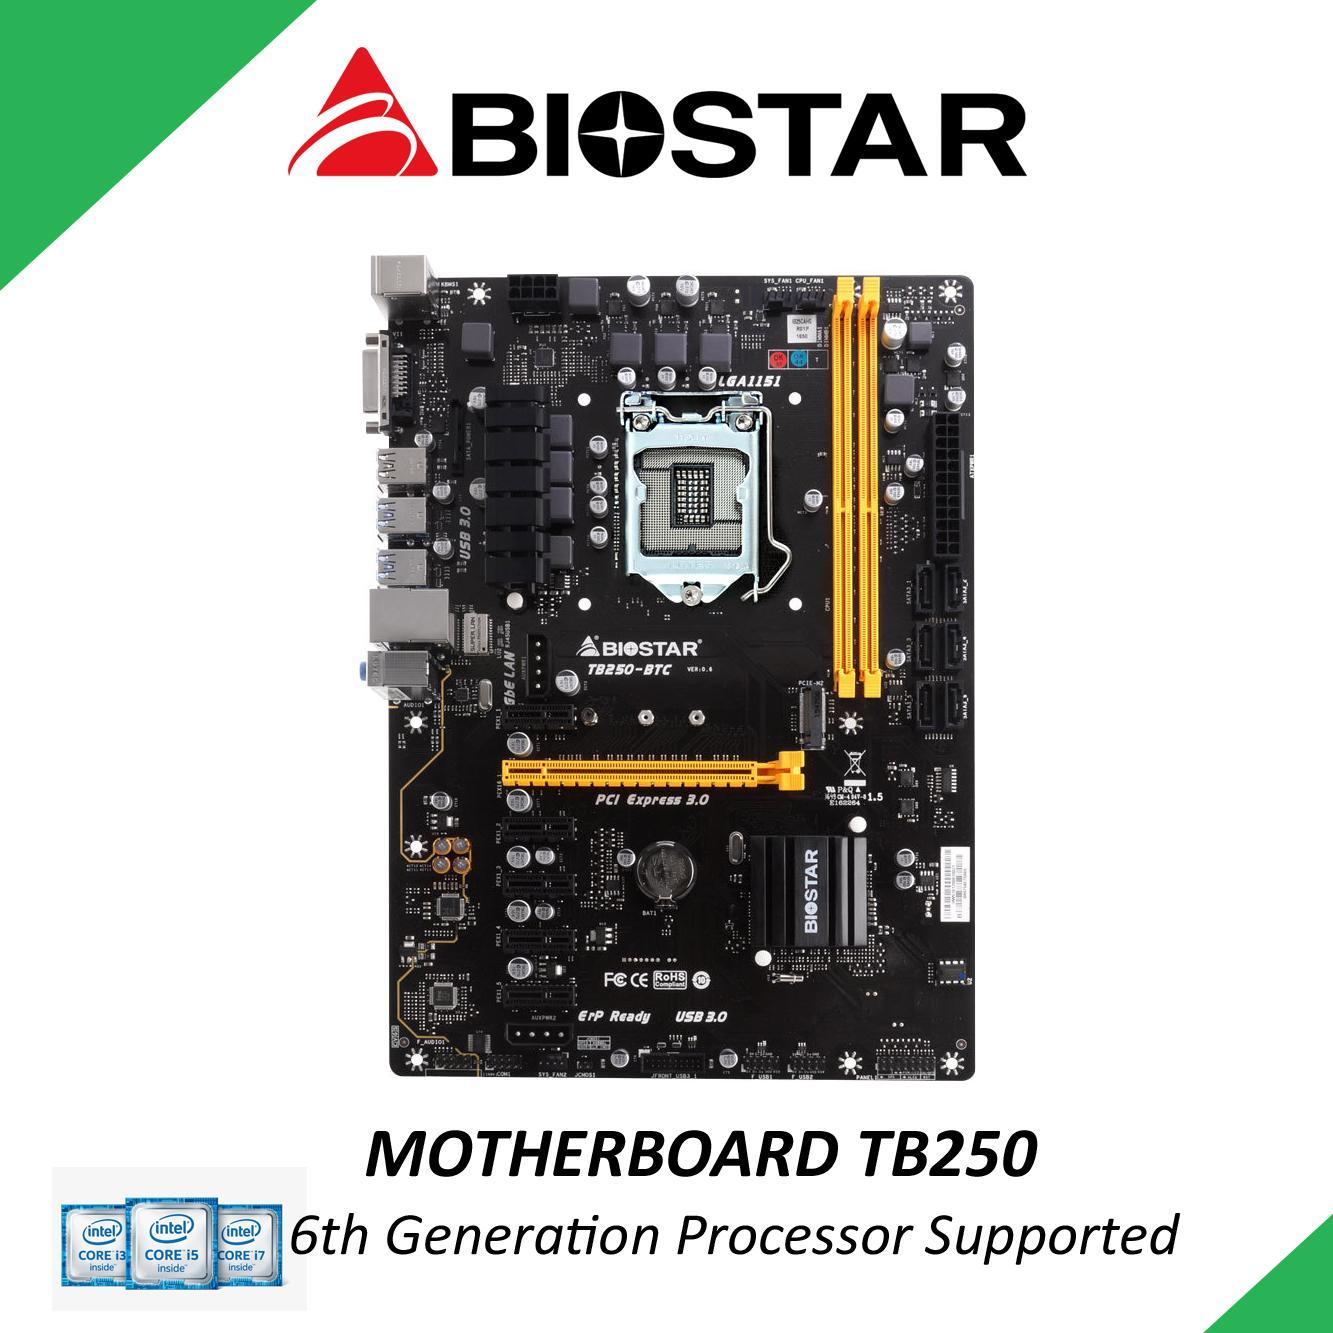 [Mother board] Original B250(1151) mother board